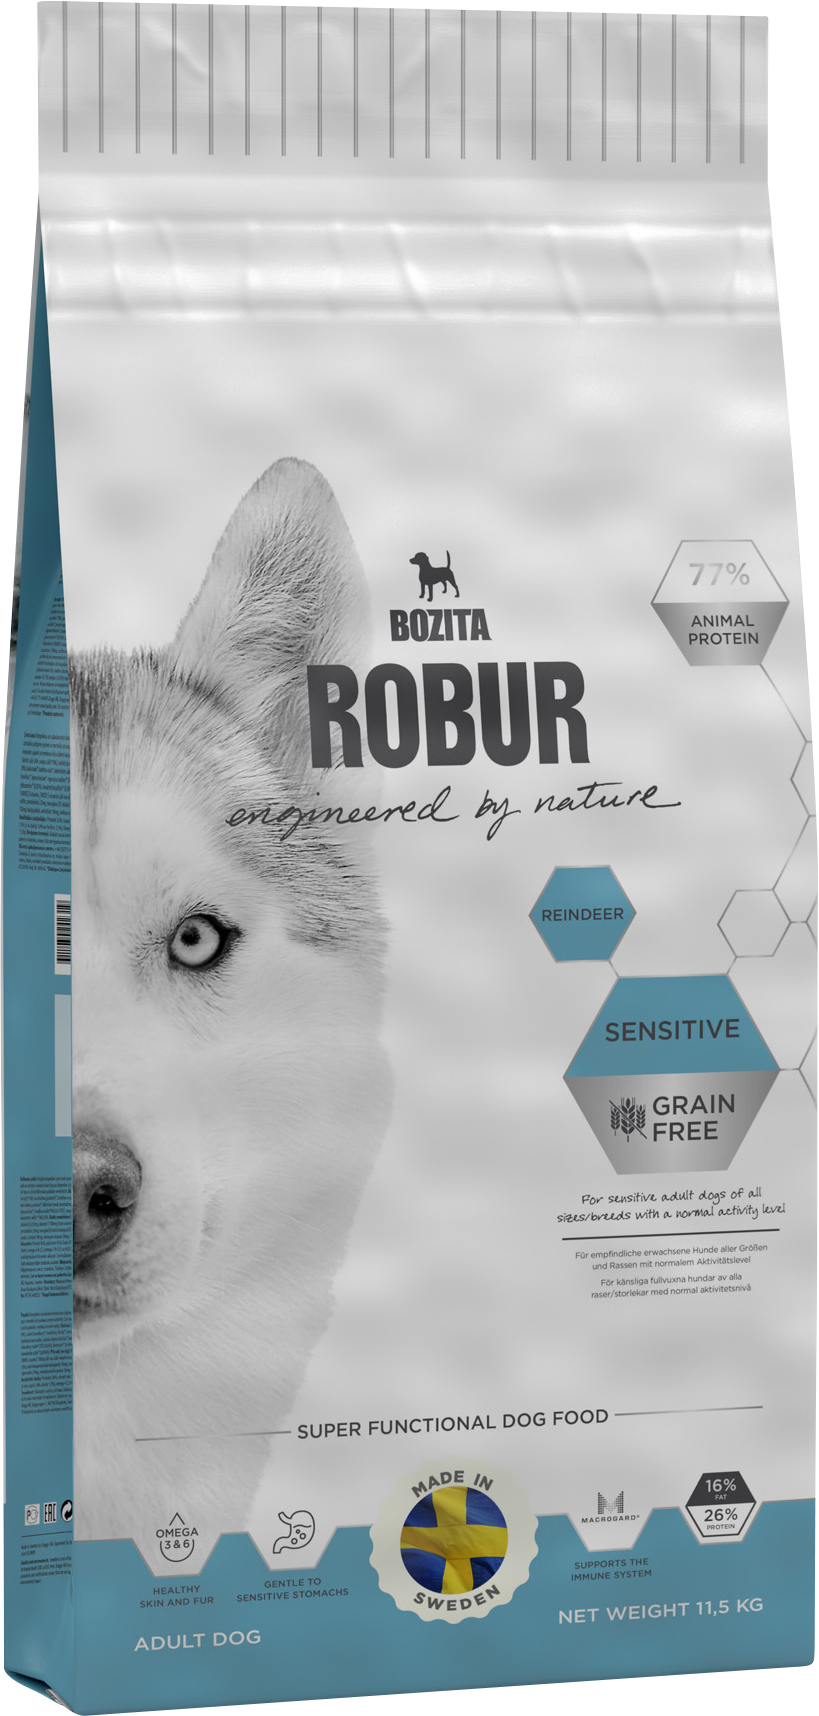 Hundfoder Bozita Robur Sensitive Grain Free Reindeer, 11,5 kg